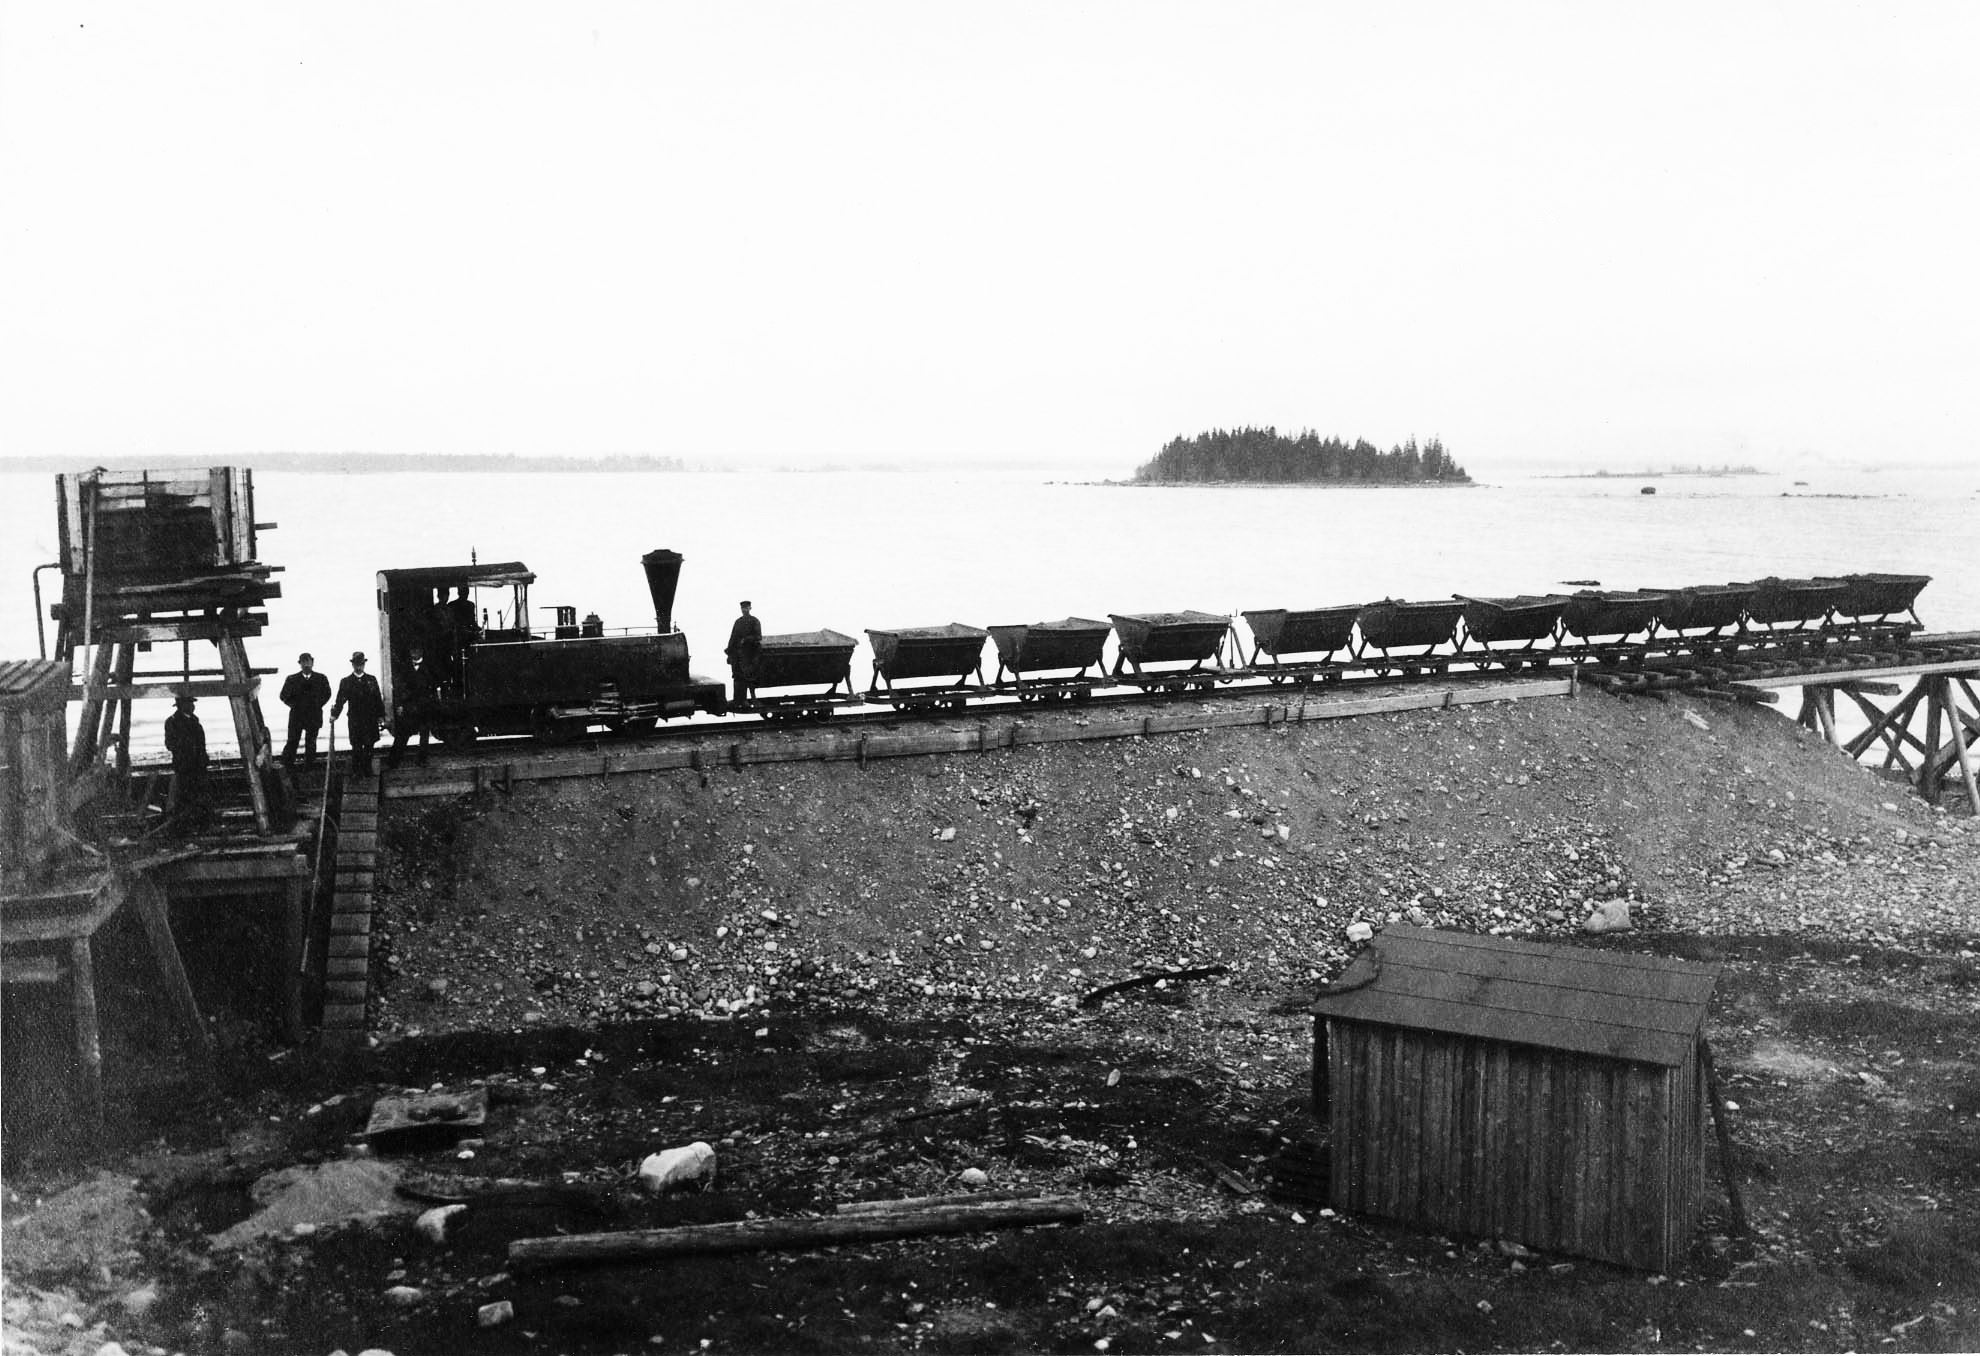 © Järnvägsmuseet, The train hall and steam train trips